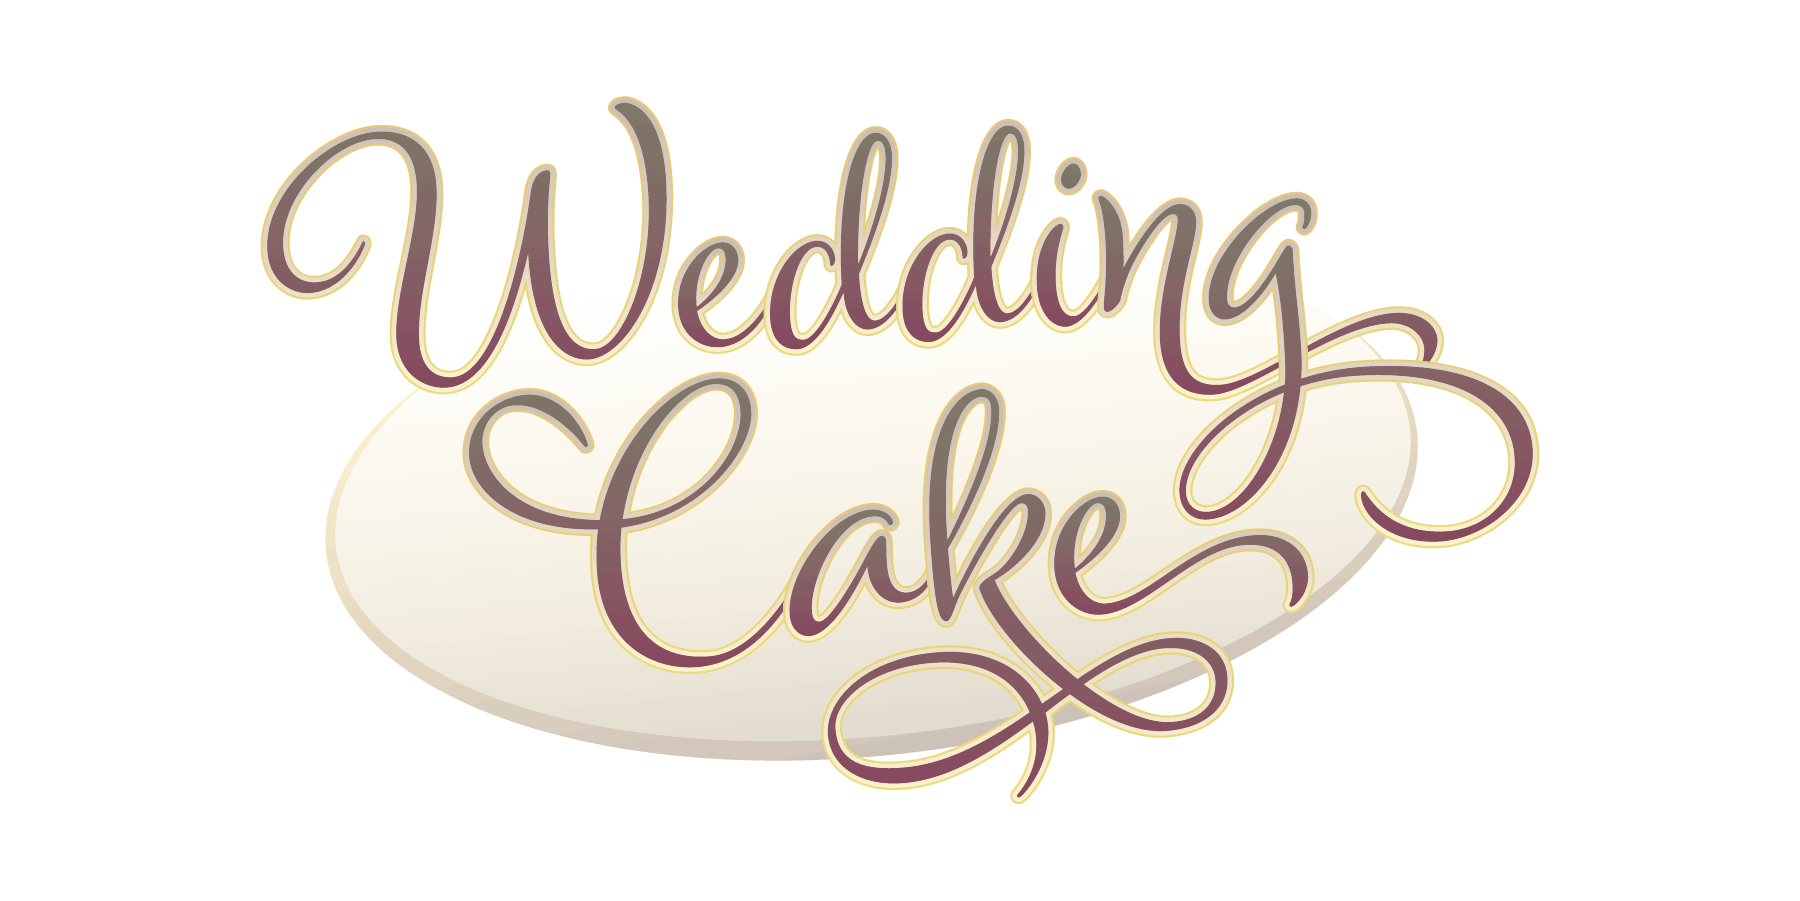 StrainLogo_WeddingCake